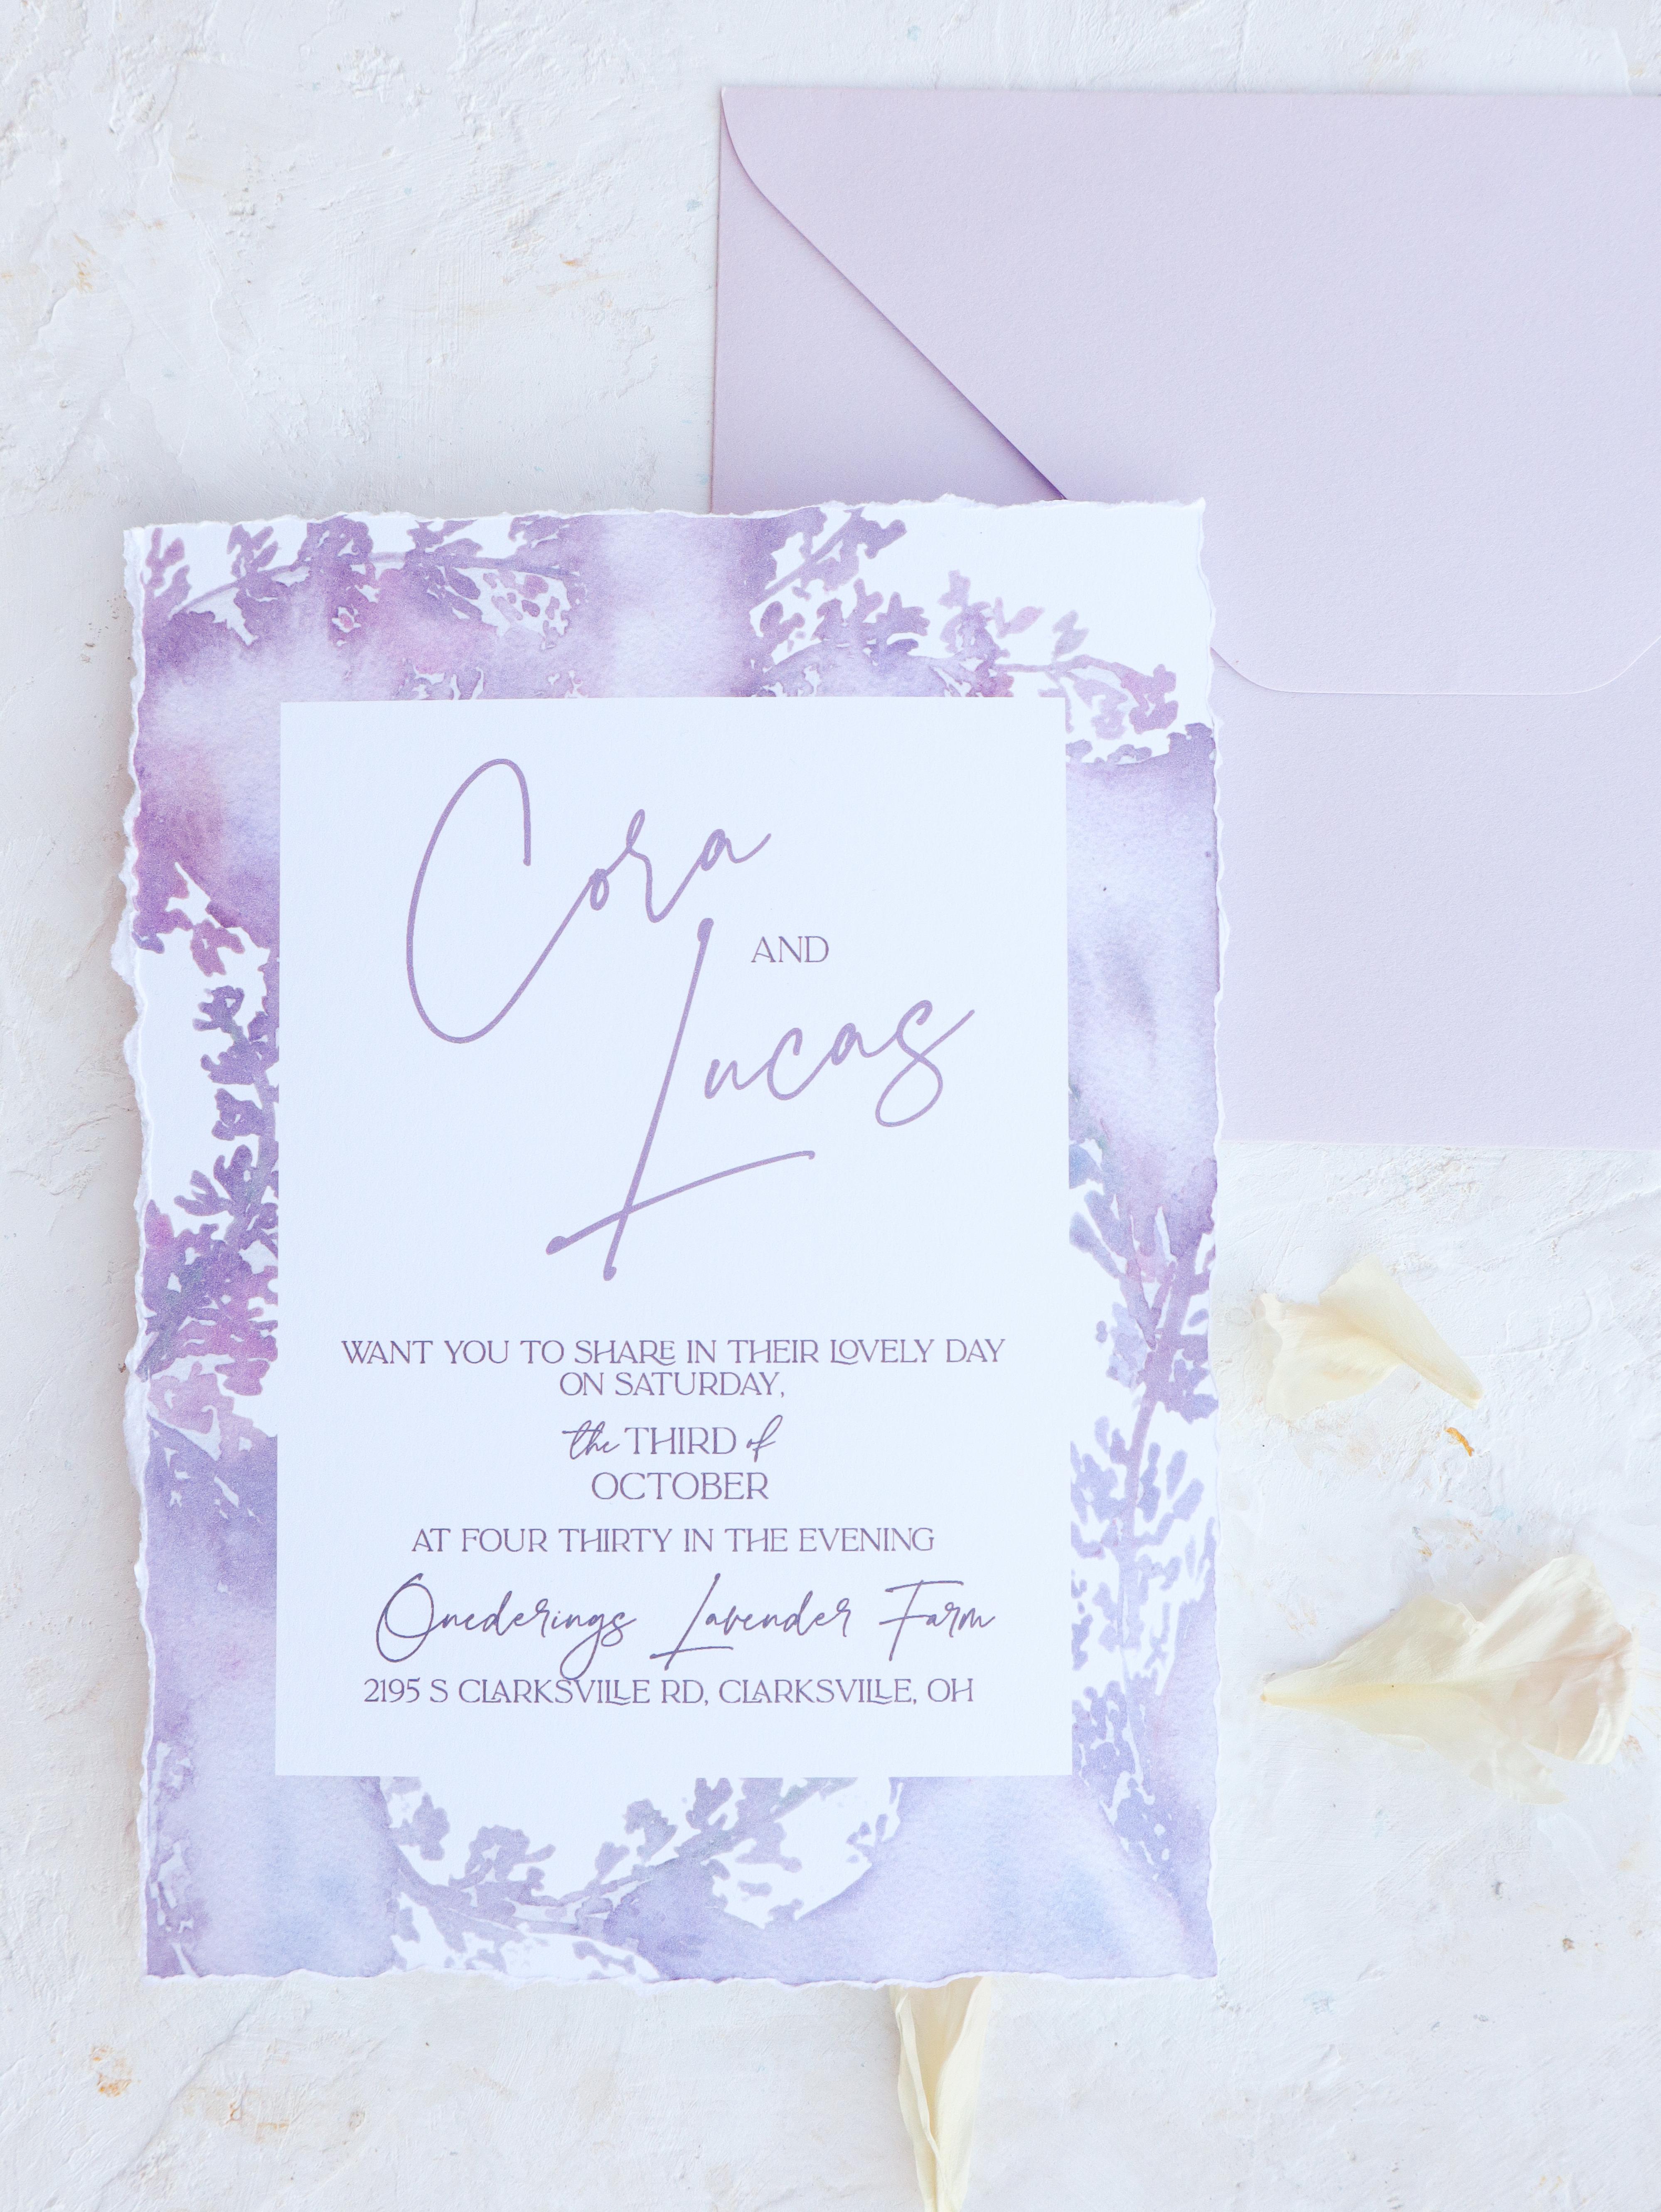 Romantic Lavender Wedding Invitation with torn edges